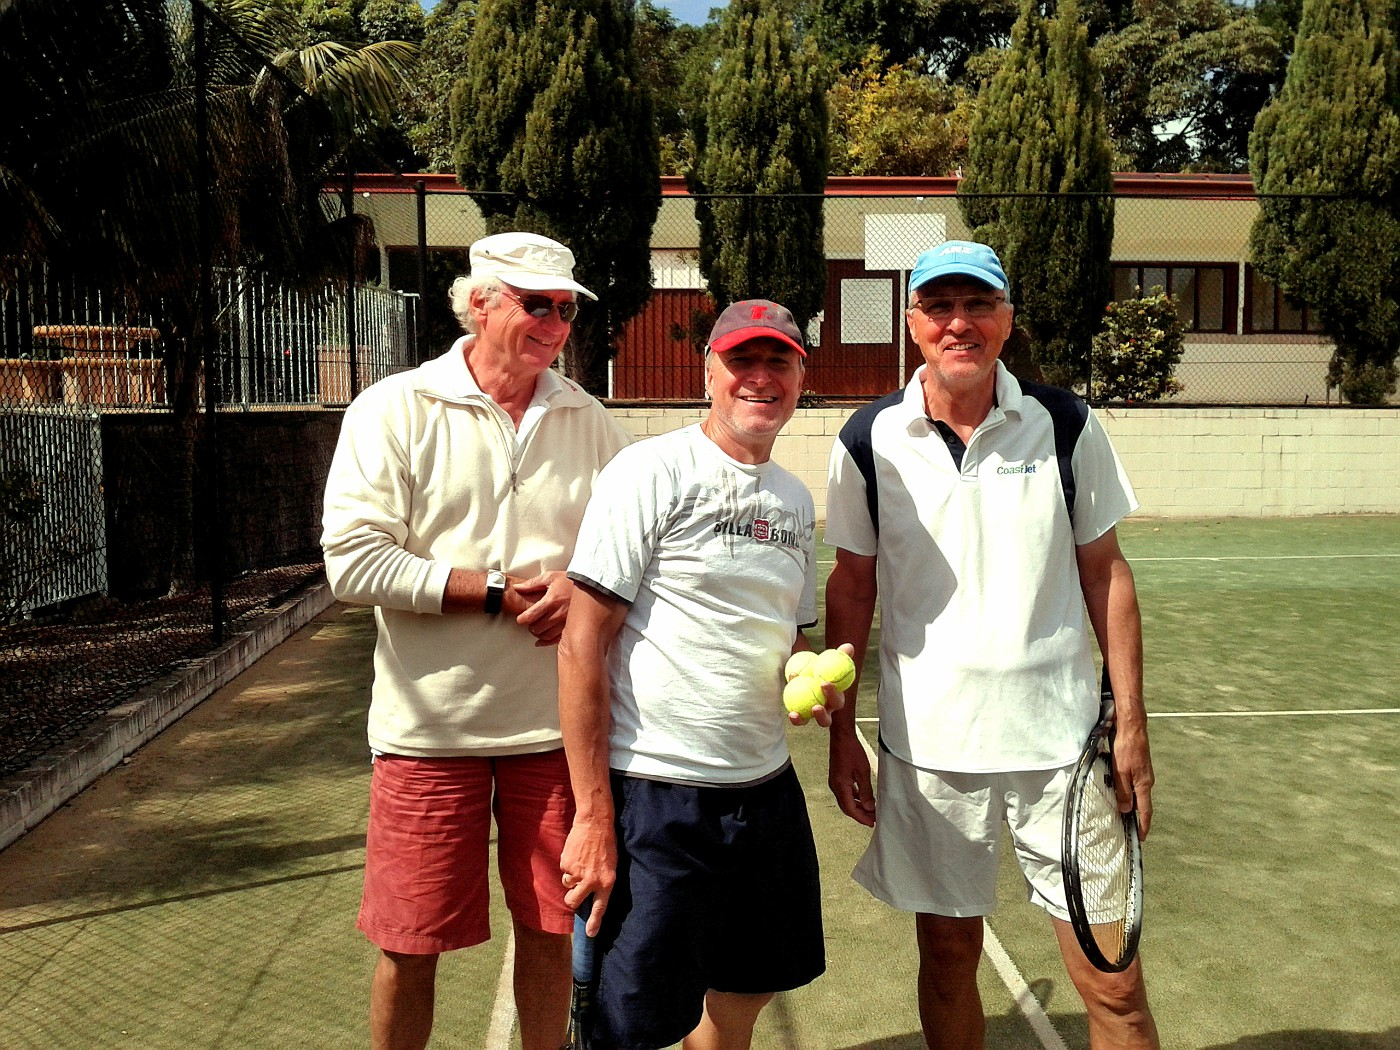 2011 09 27 2 Tues tennis guys Bernd and Gerhard